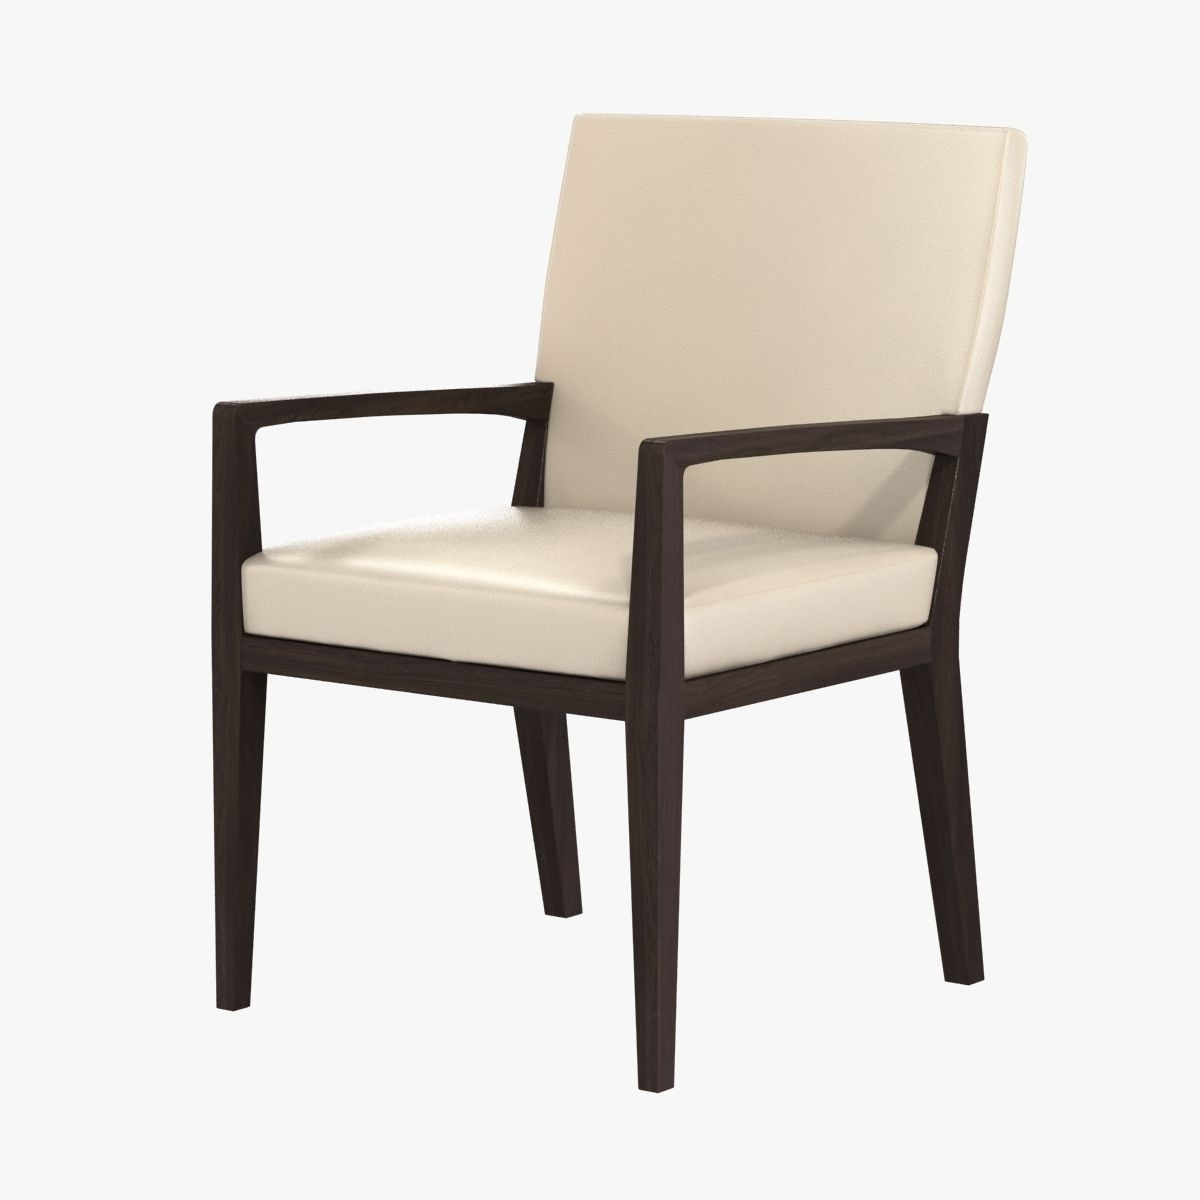 Holly Hunt Luna Dining Arm Chair 3d Model Max Obj 3ds Fbx Mtl 5